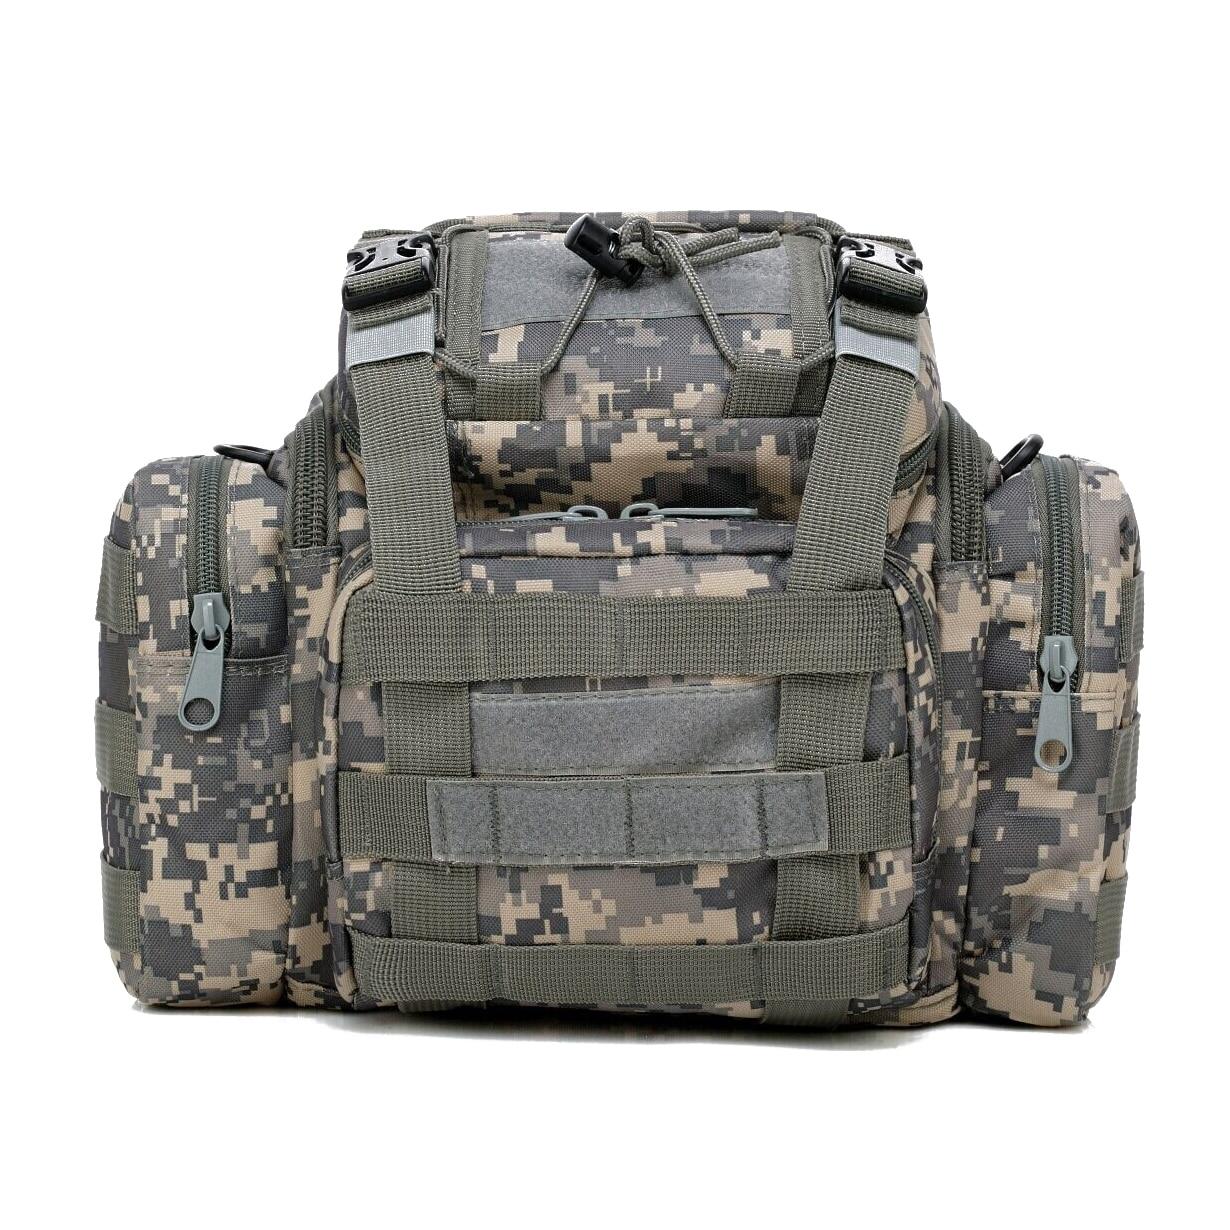 JHO-Sea/<font><b>Carp</b></font>/Fly Fishing Tackle Bag Waterproof Storage Waist Shoulder Carry Case ACU Camouflage